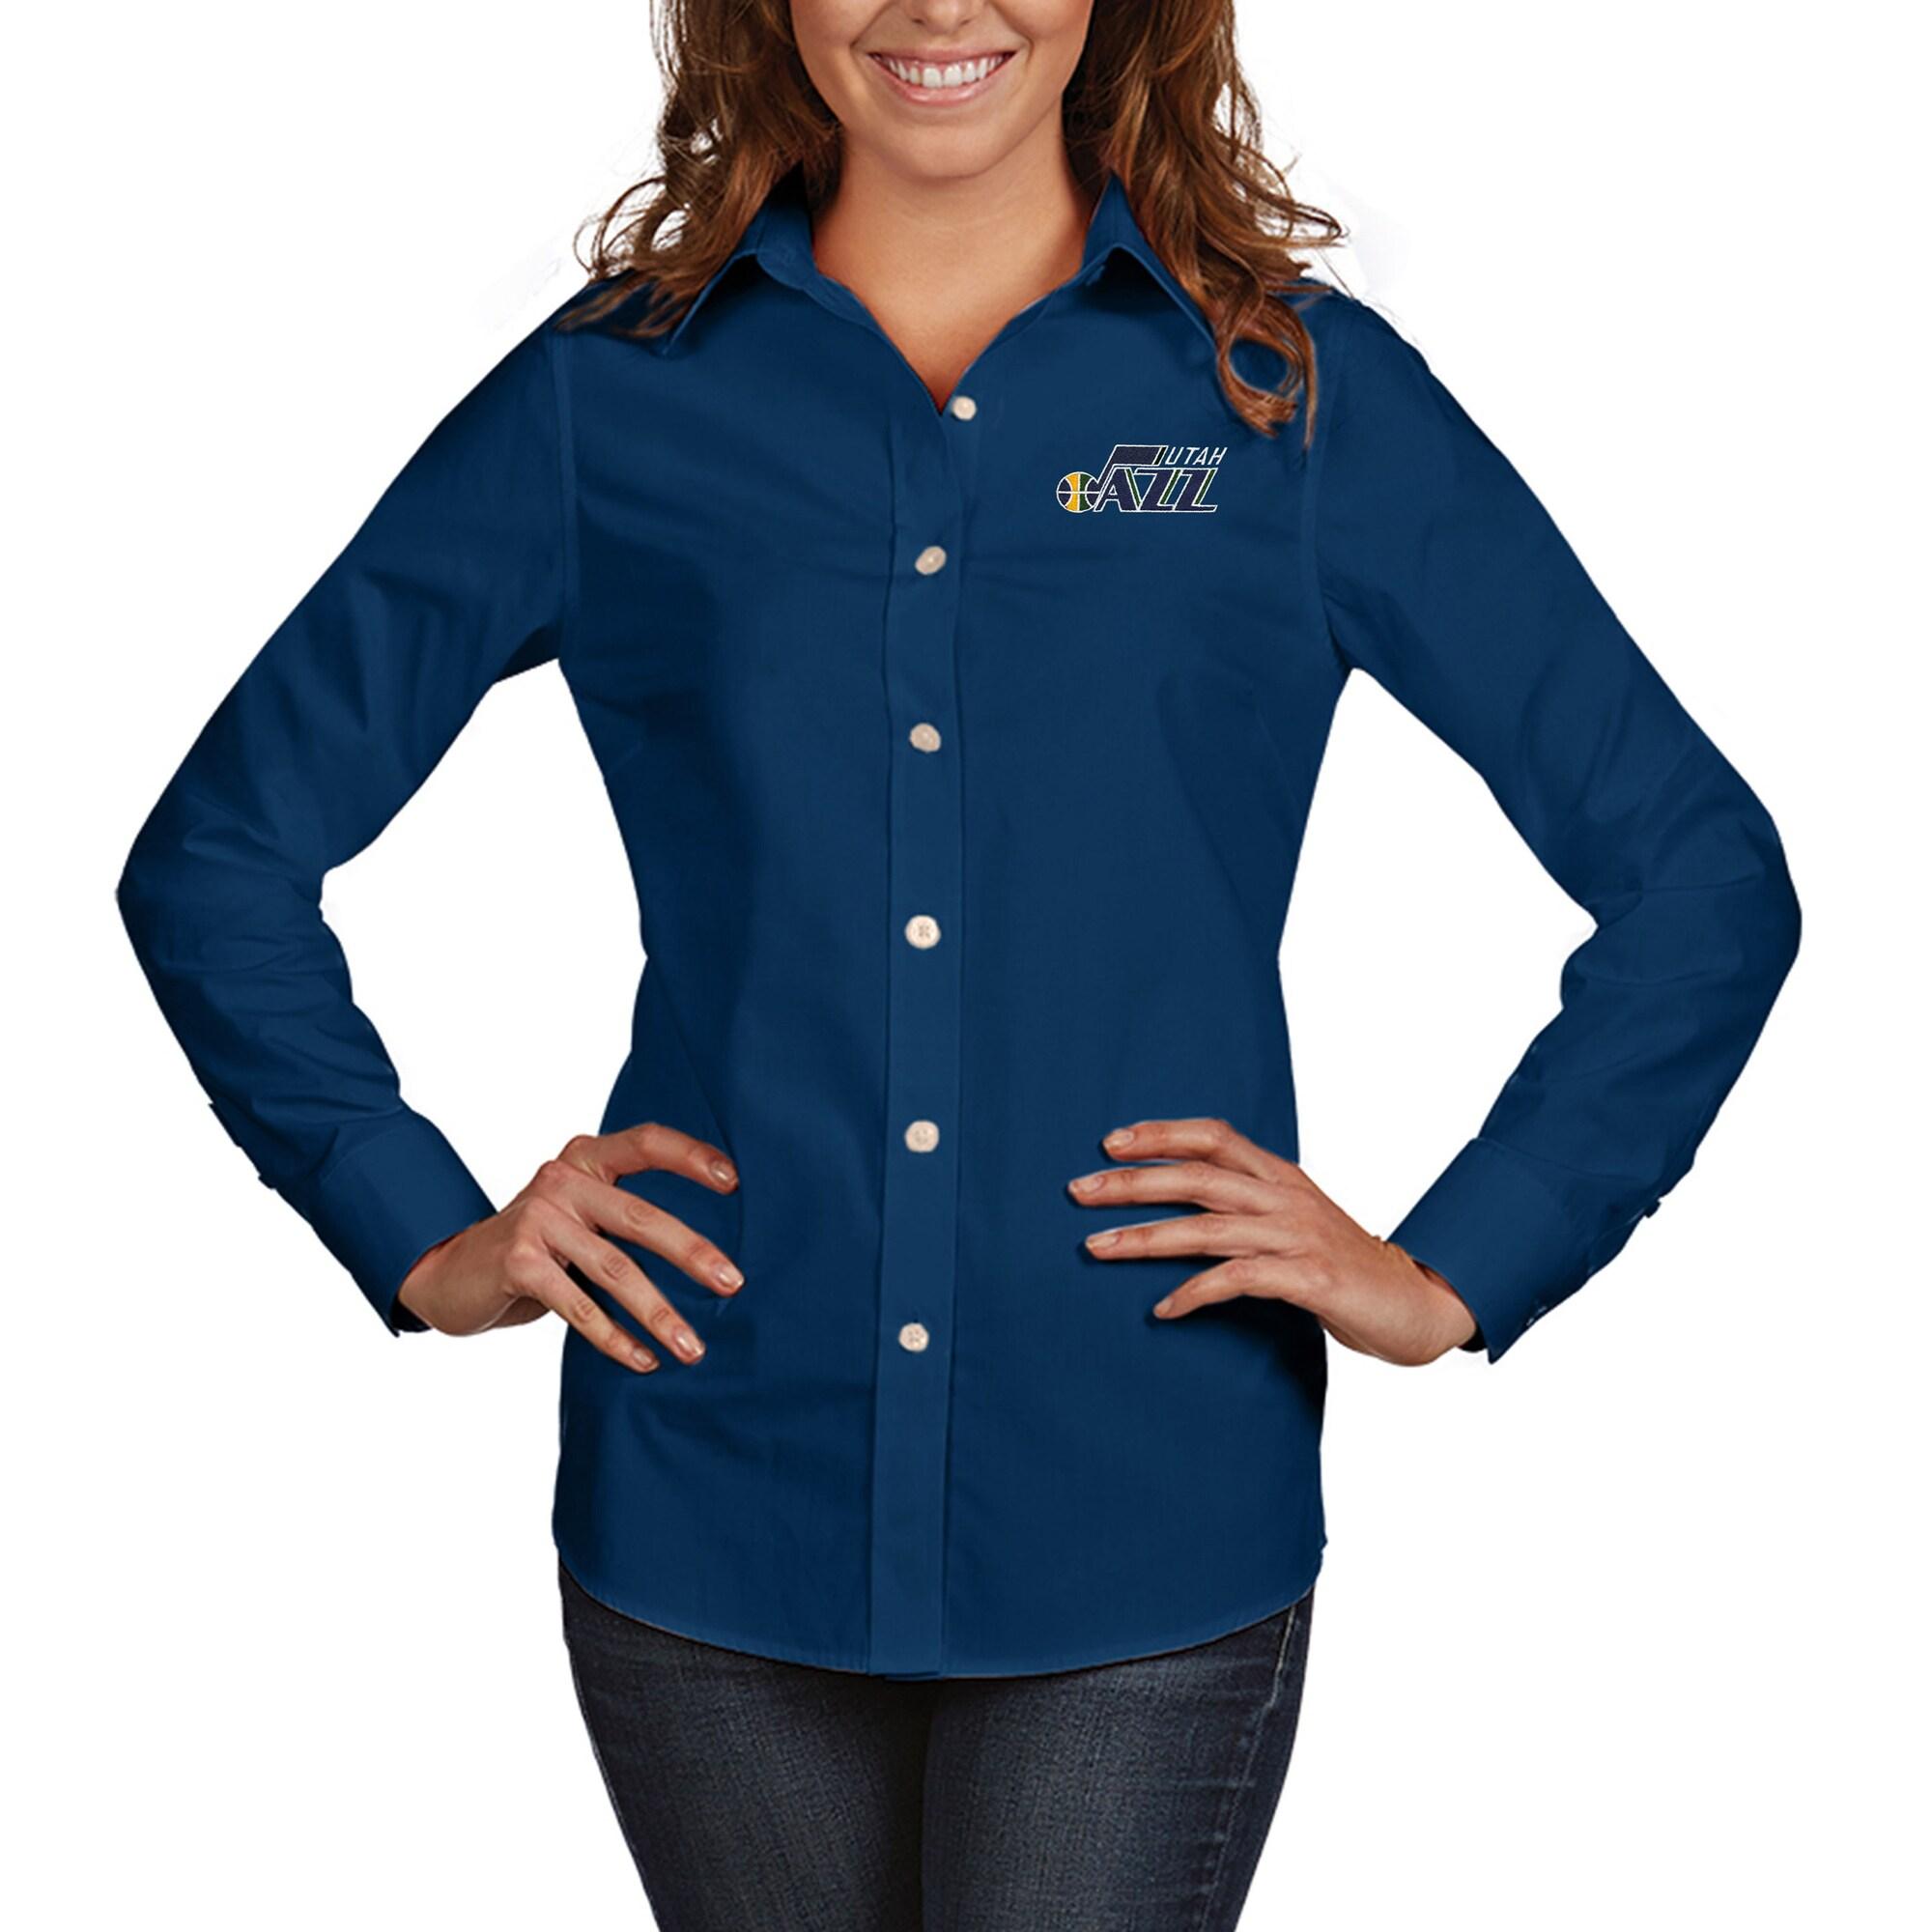 Utah Jazz Antigua Women's Dynasty Woven Button-Up Long Sleeve Shirt - Navy